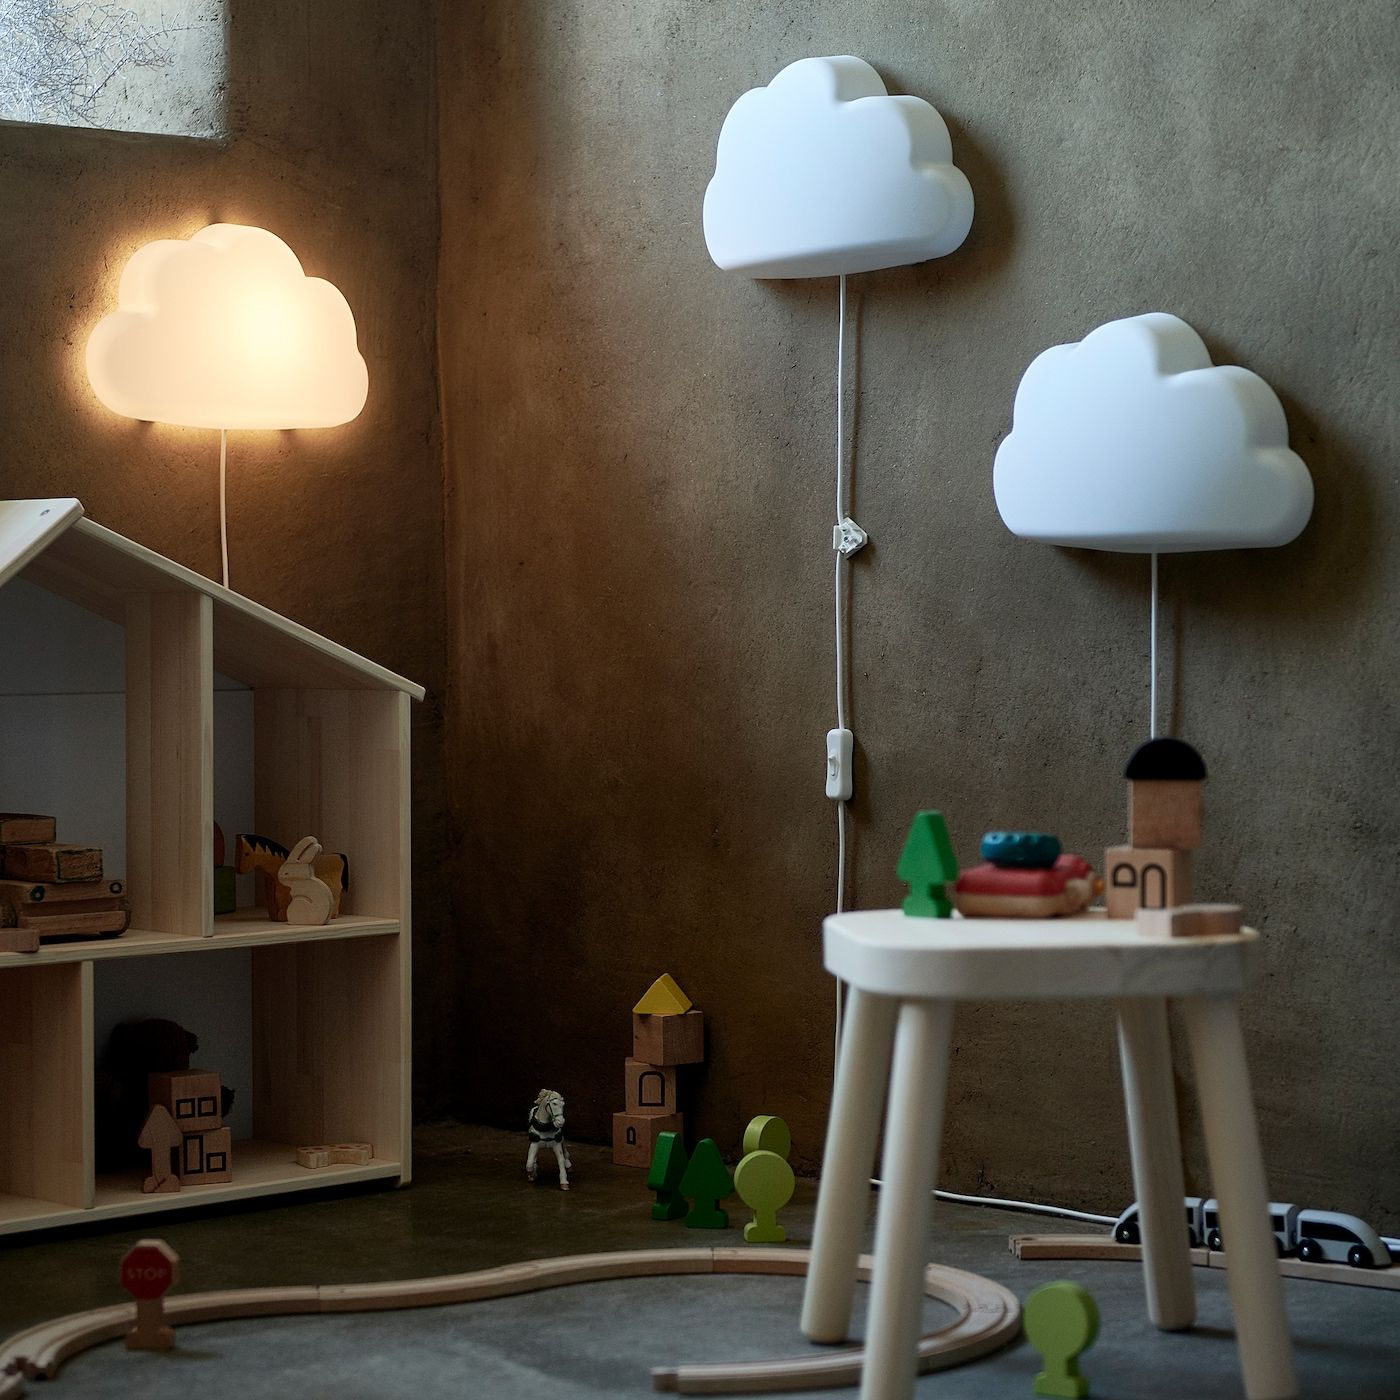 Upplyst Led Wall Lamp Cloud White Ikea In 2020 Led Wall Lamp Ikea Wall Lights Wall Lamp